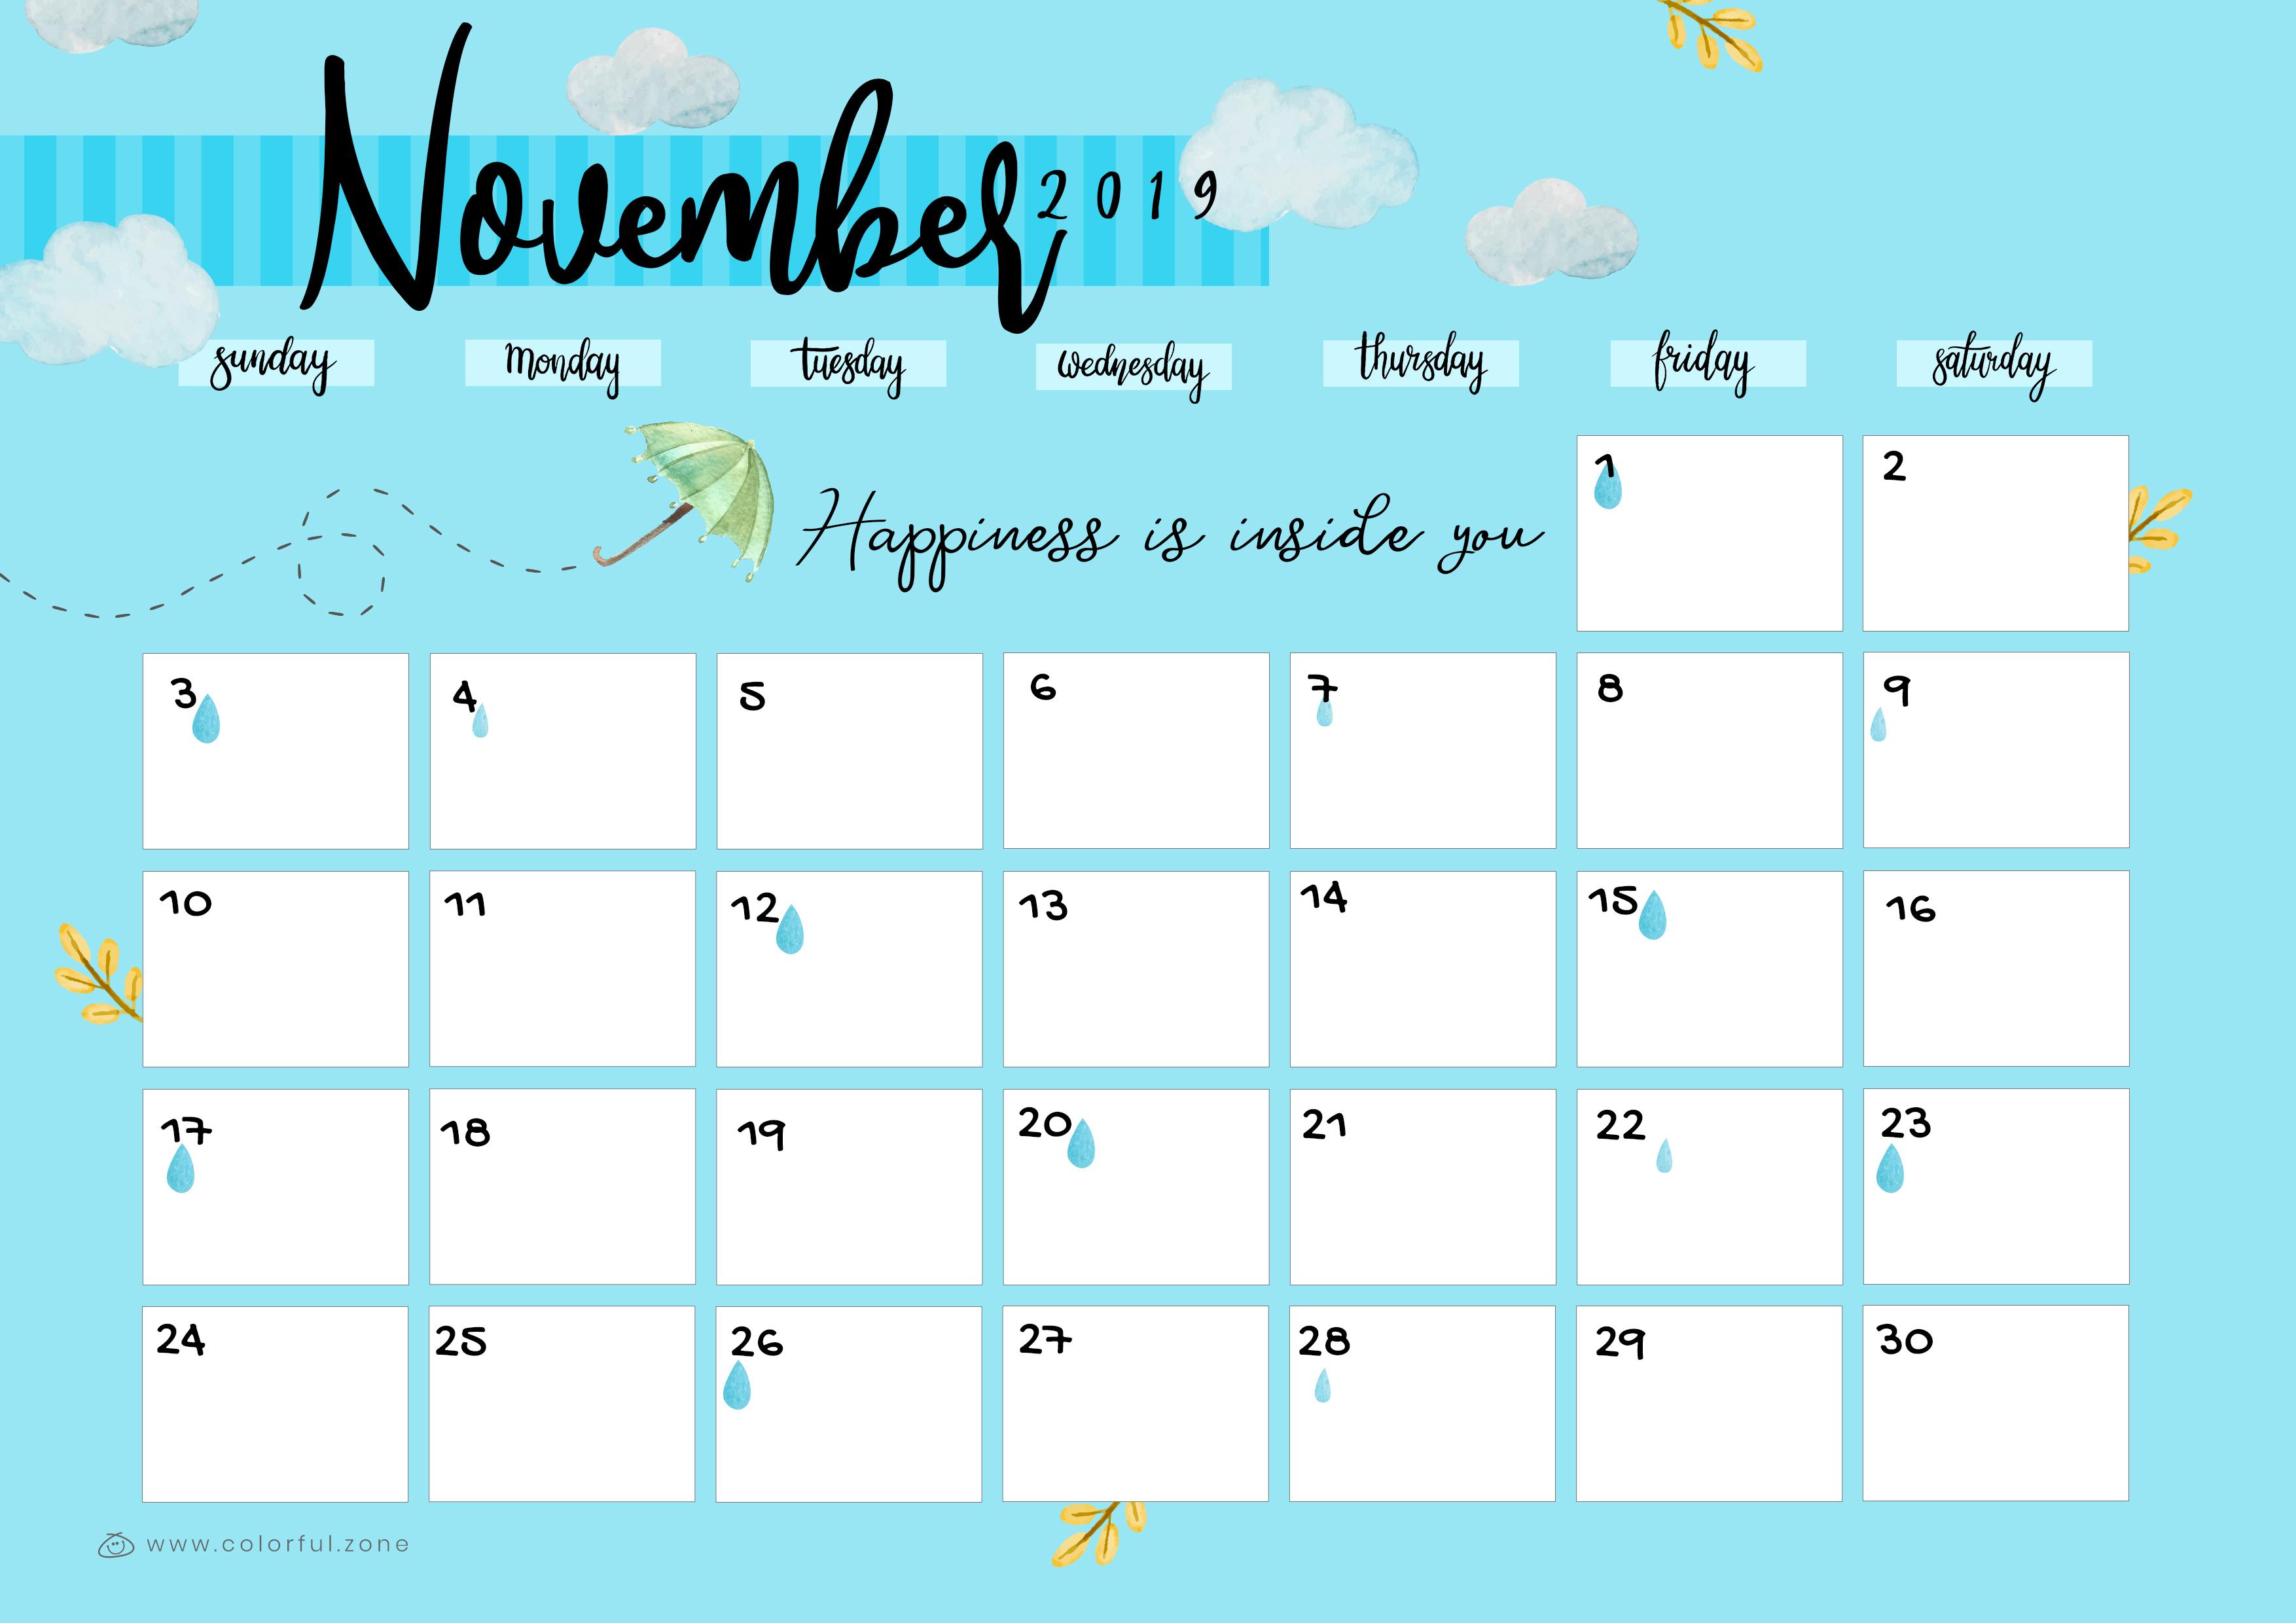 November Printable Colorful Calendar 2019